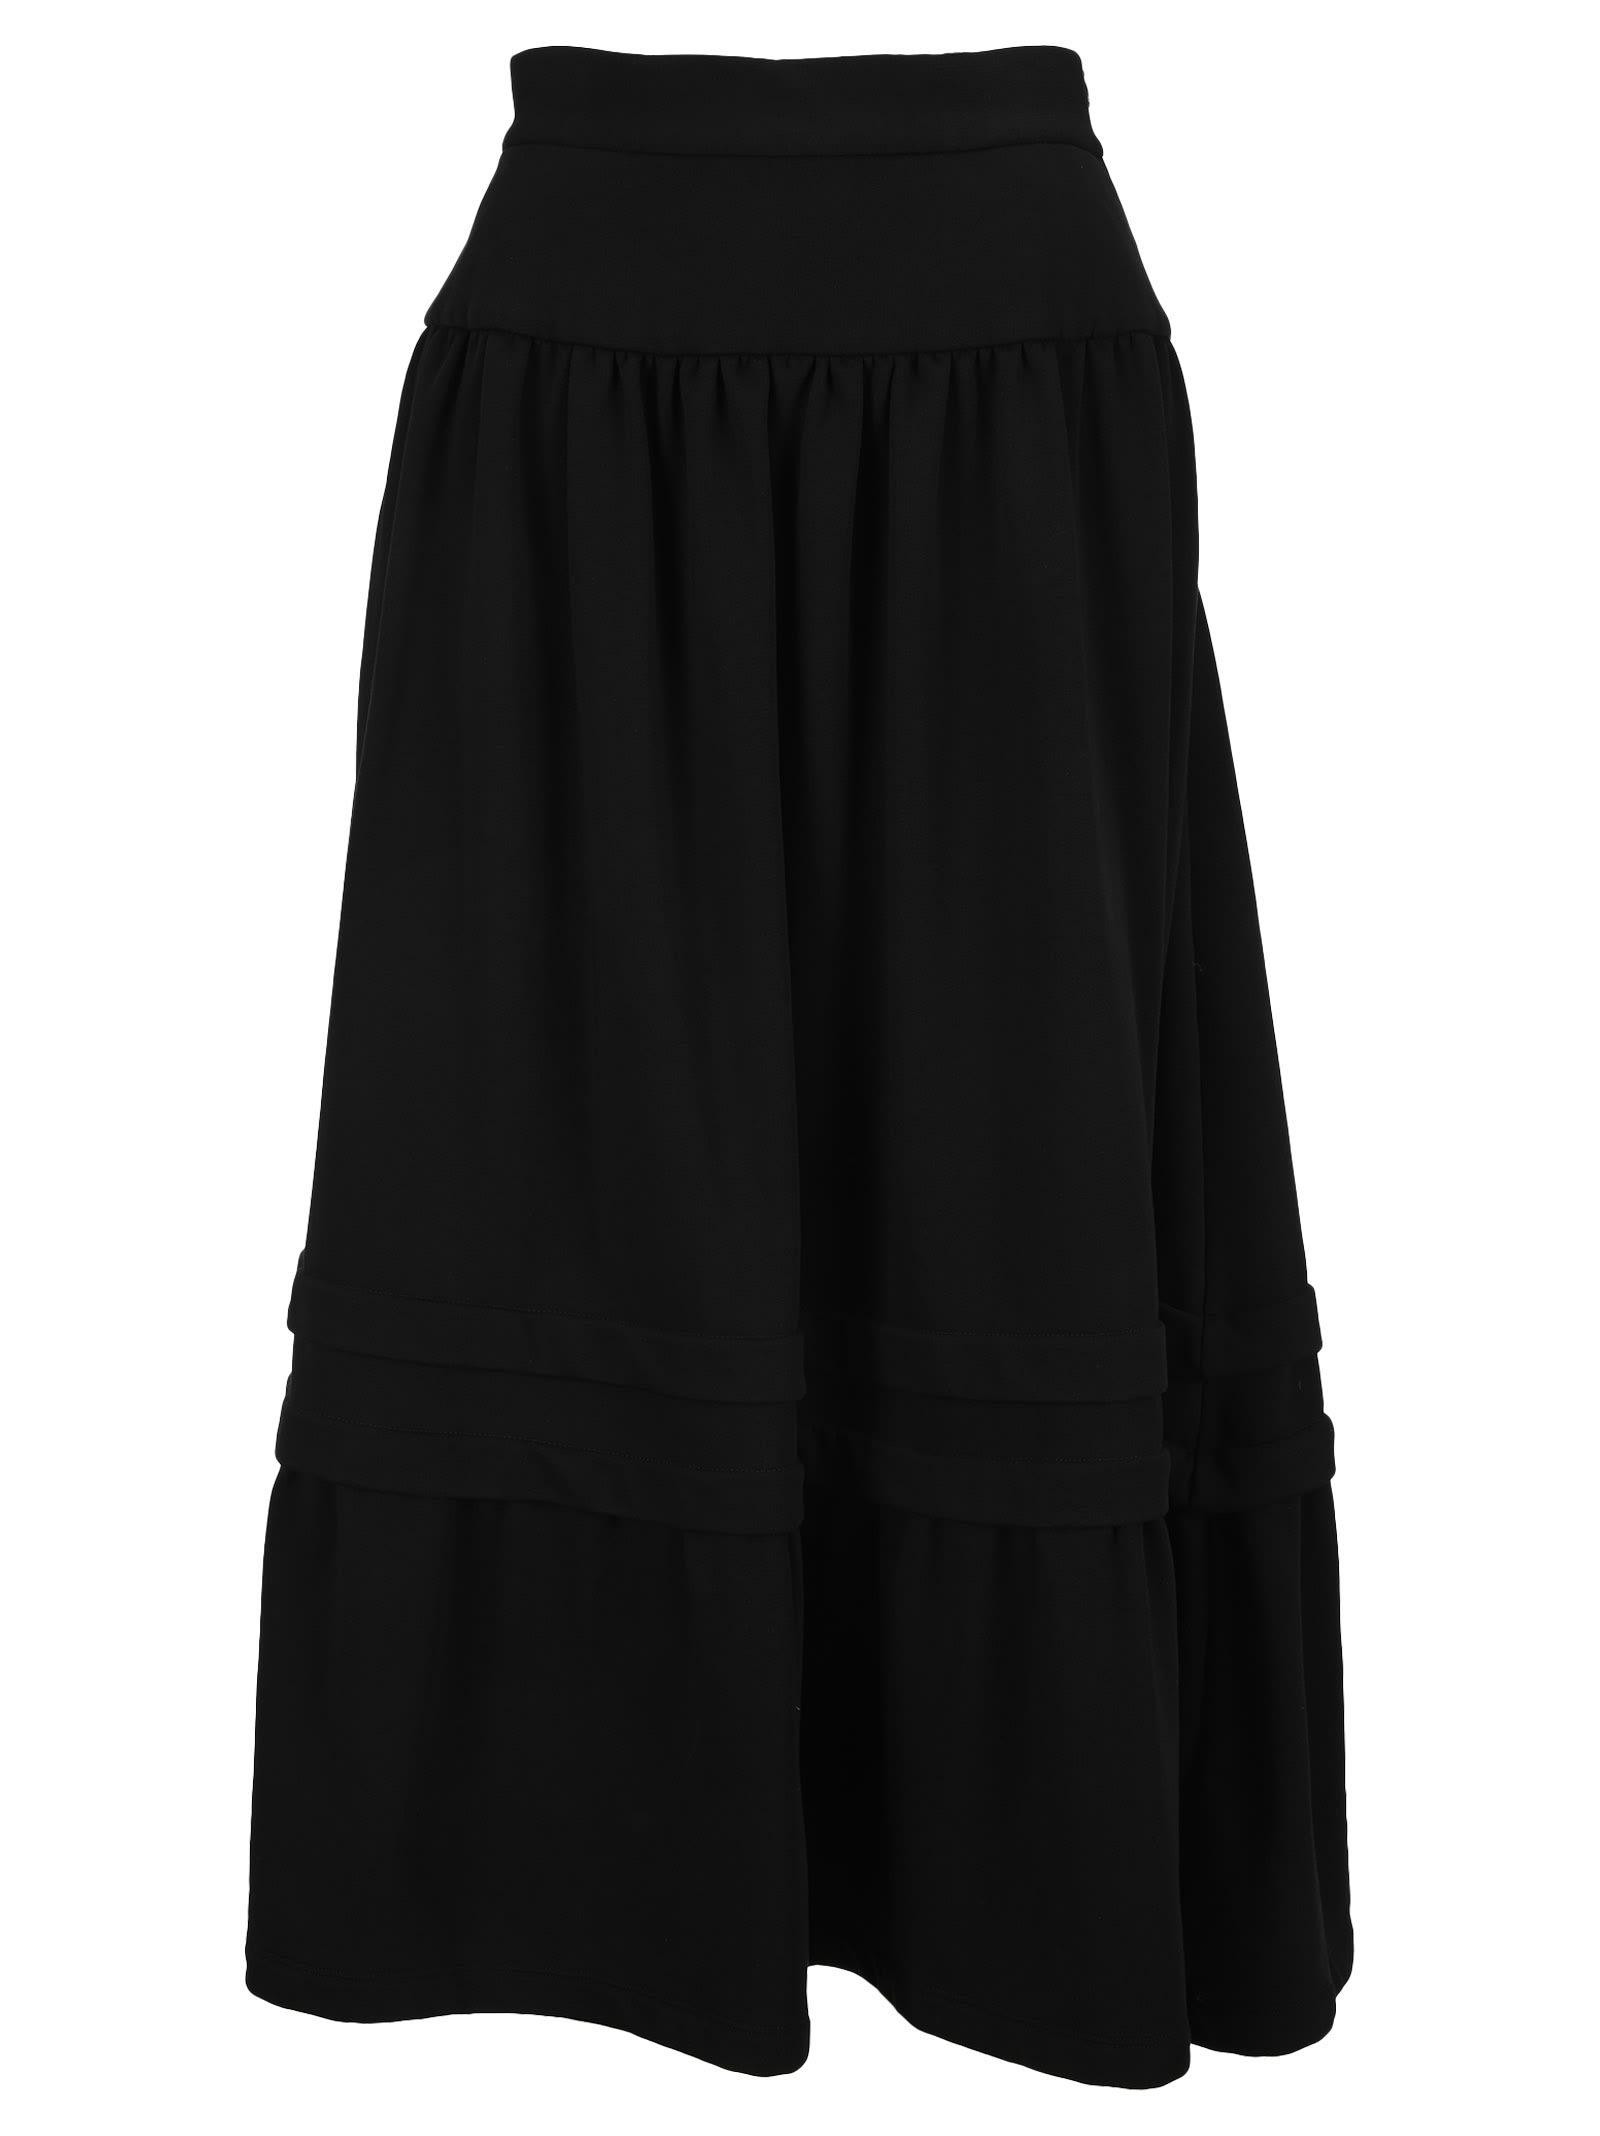 Mm6 Tiered Skirt